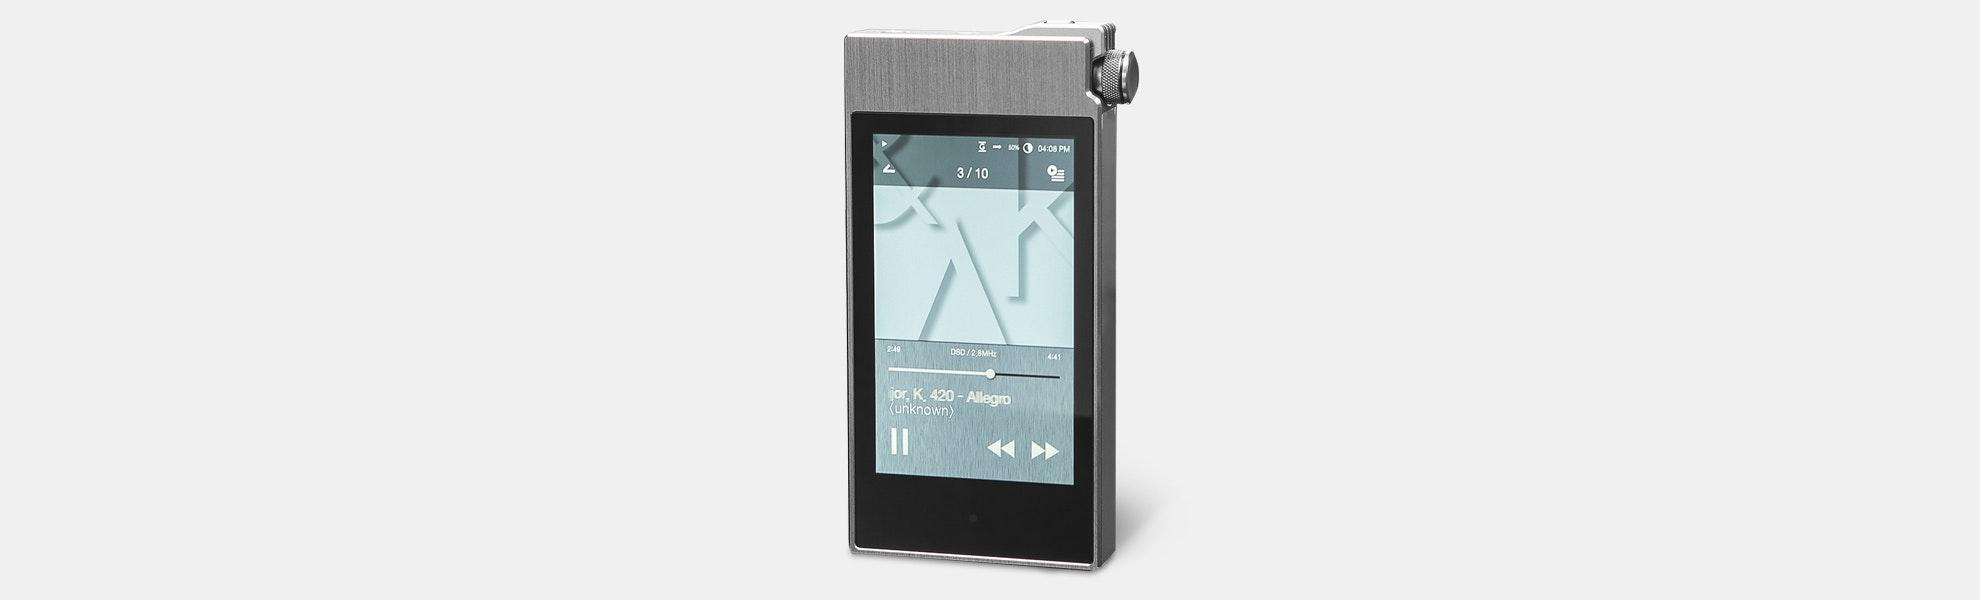 Astell&Kern AK100II Digital Audio Player